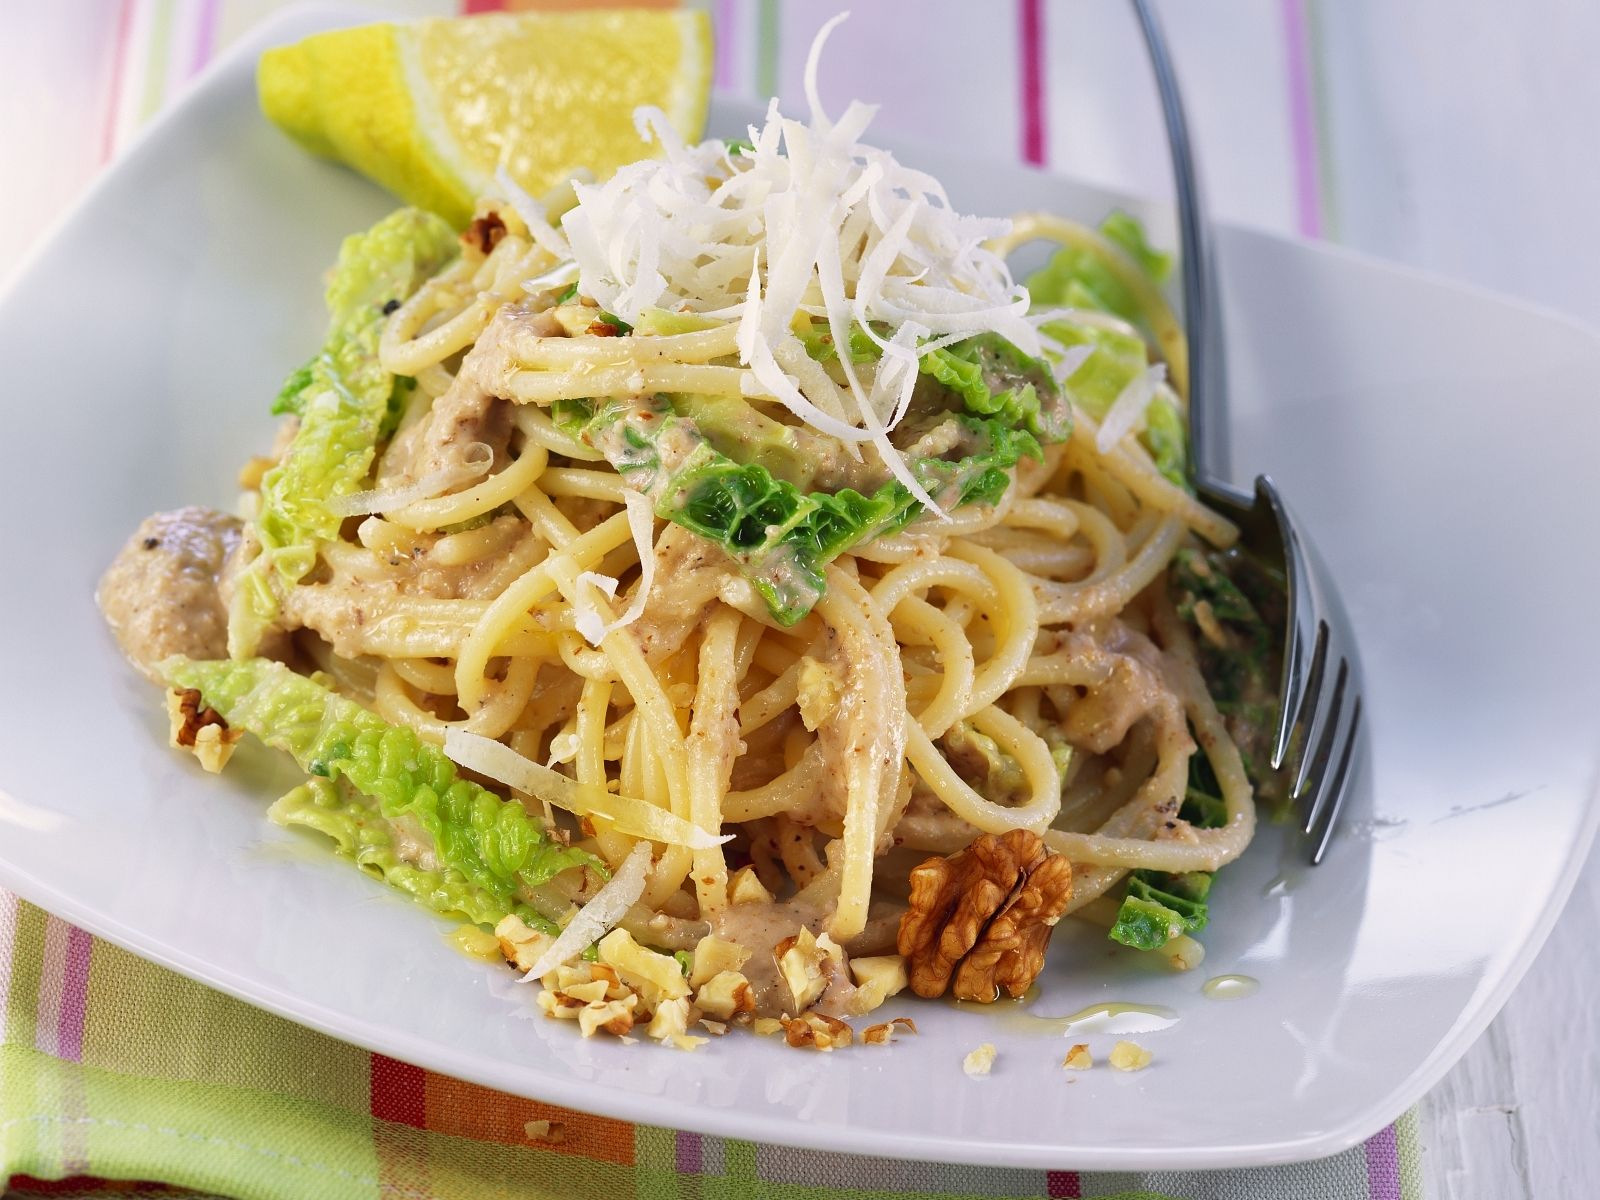 WW = Wirsing und Walnuss :-D Wirsing-Walnuss-Pasta - smarter - Kalorien: 675 Kcal - Zeit: 40 Min. | eatsmarter.de